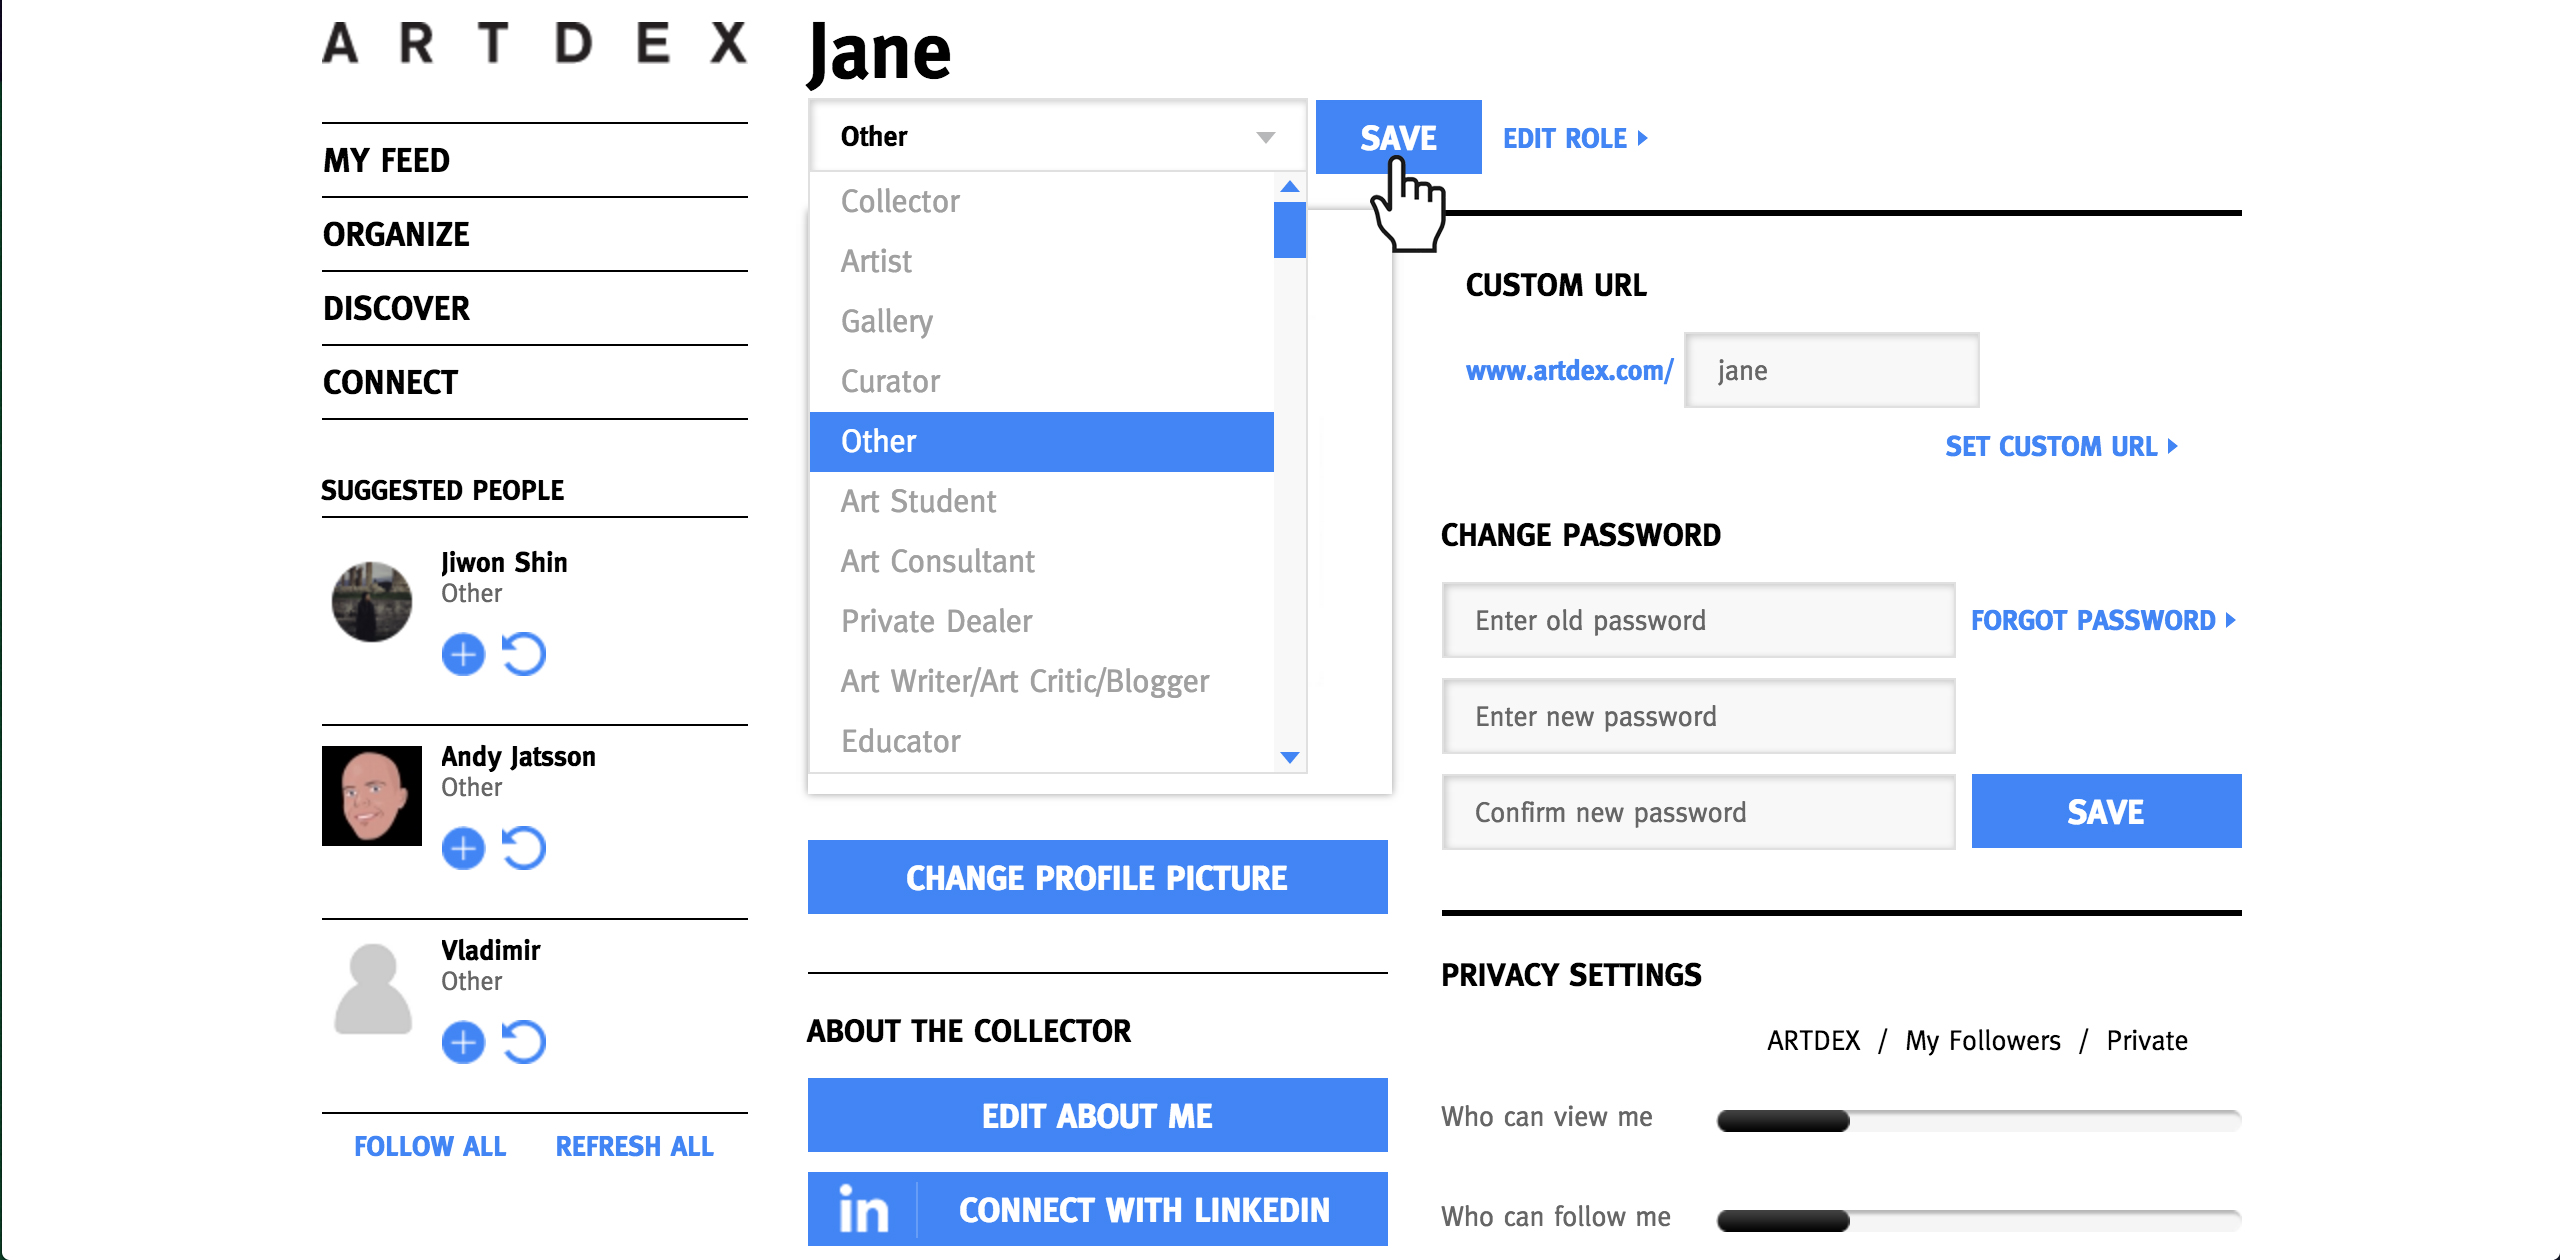 Editing Your ARTDEX Role